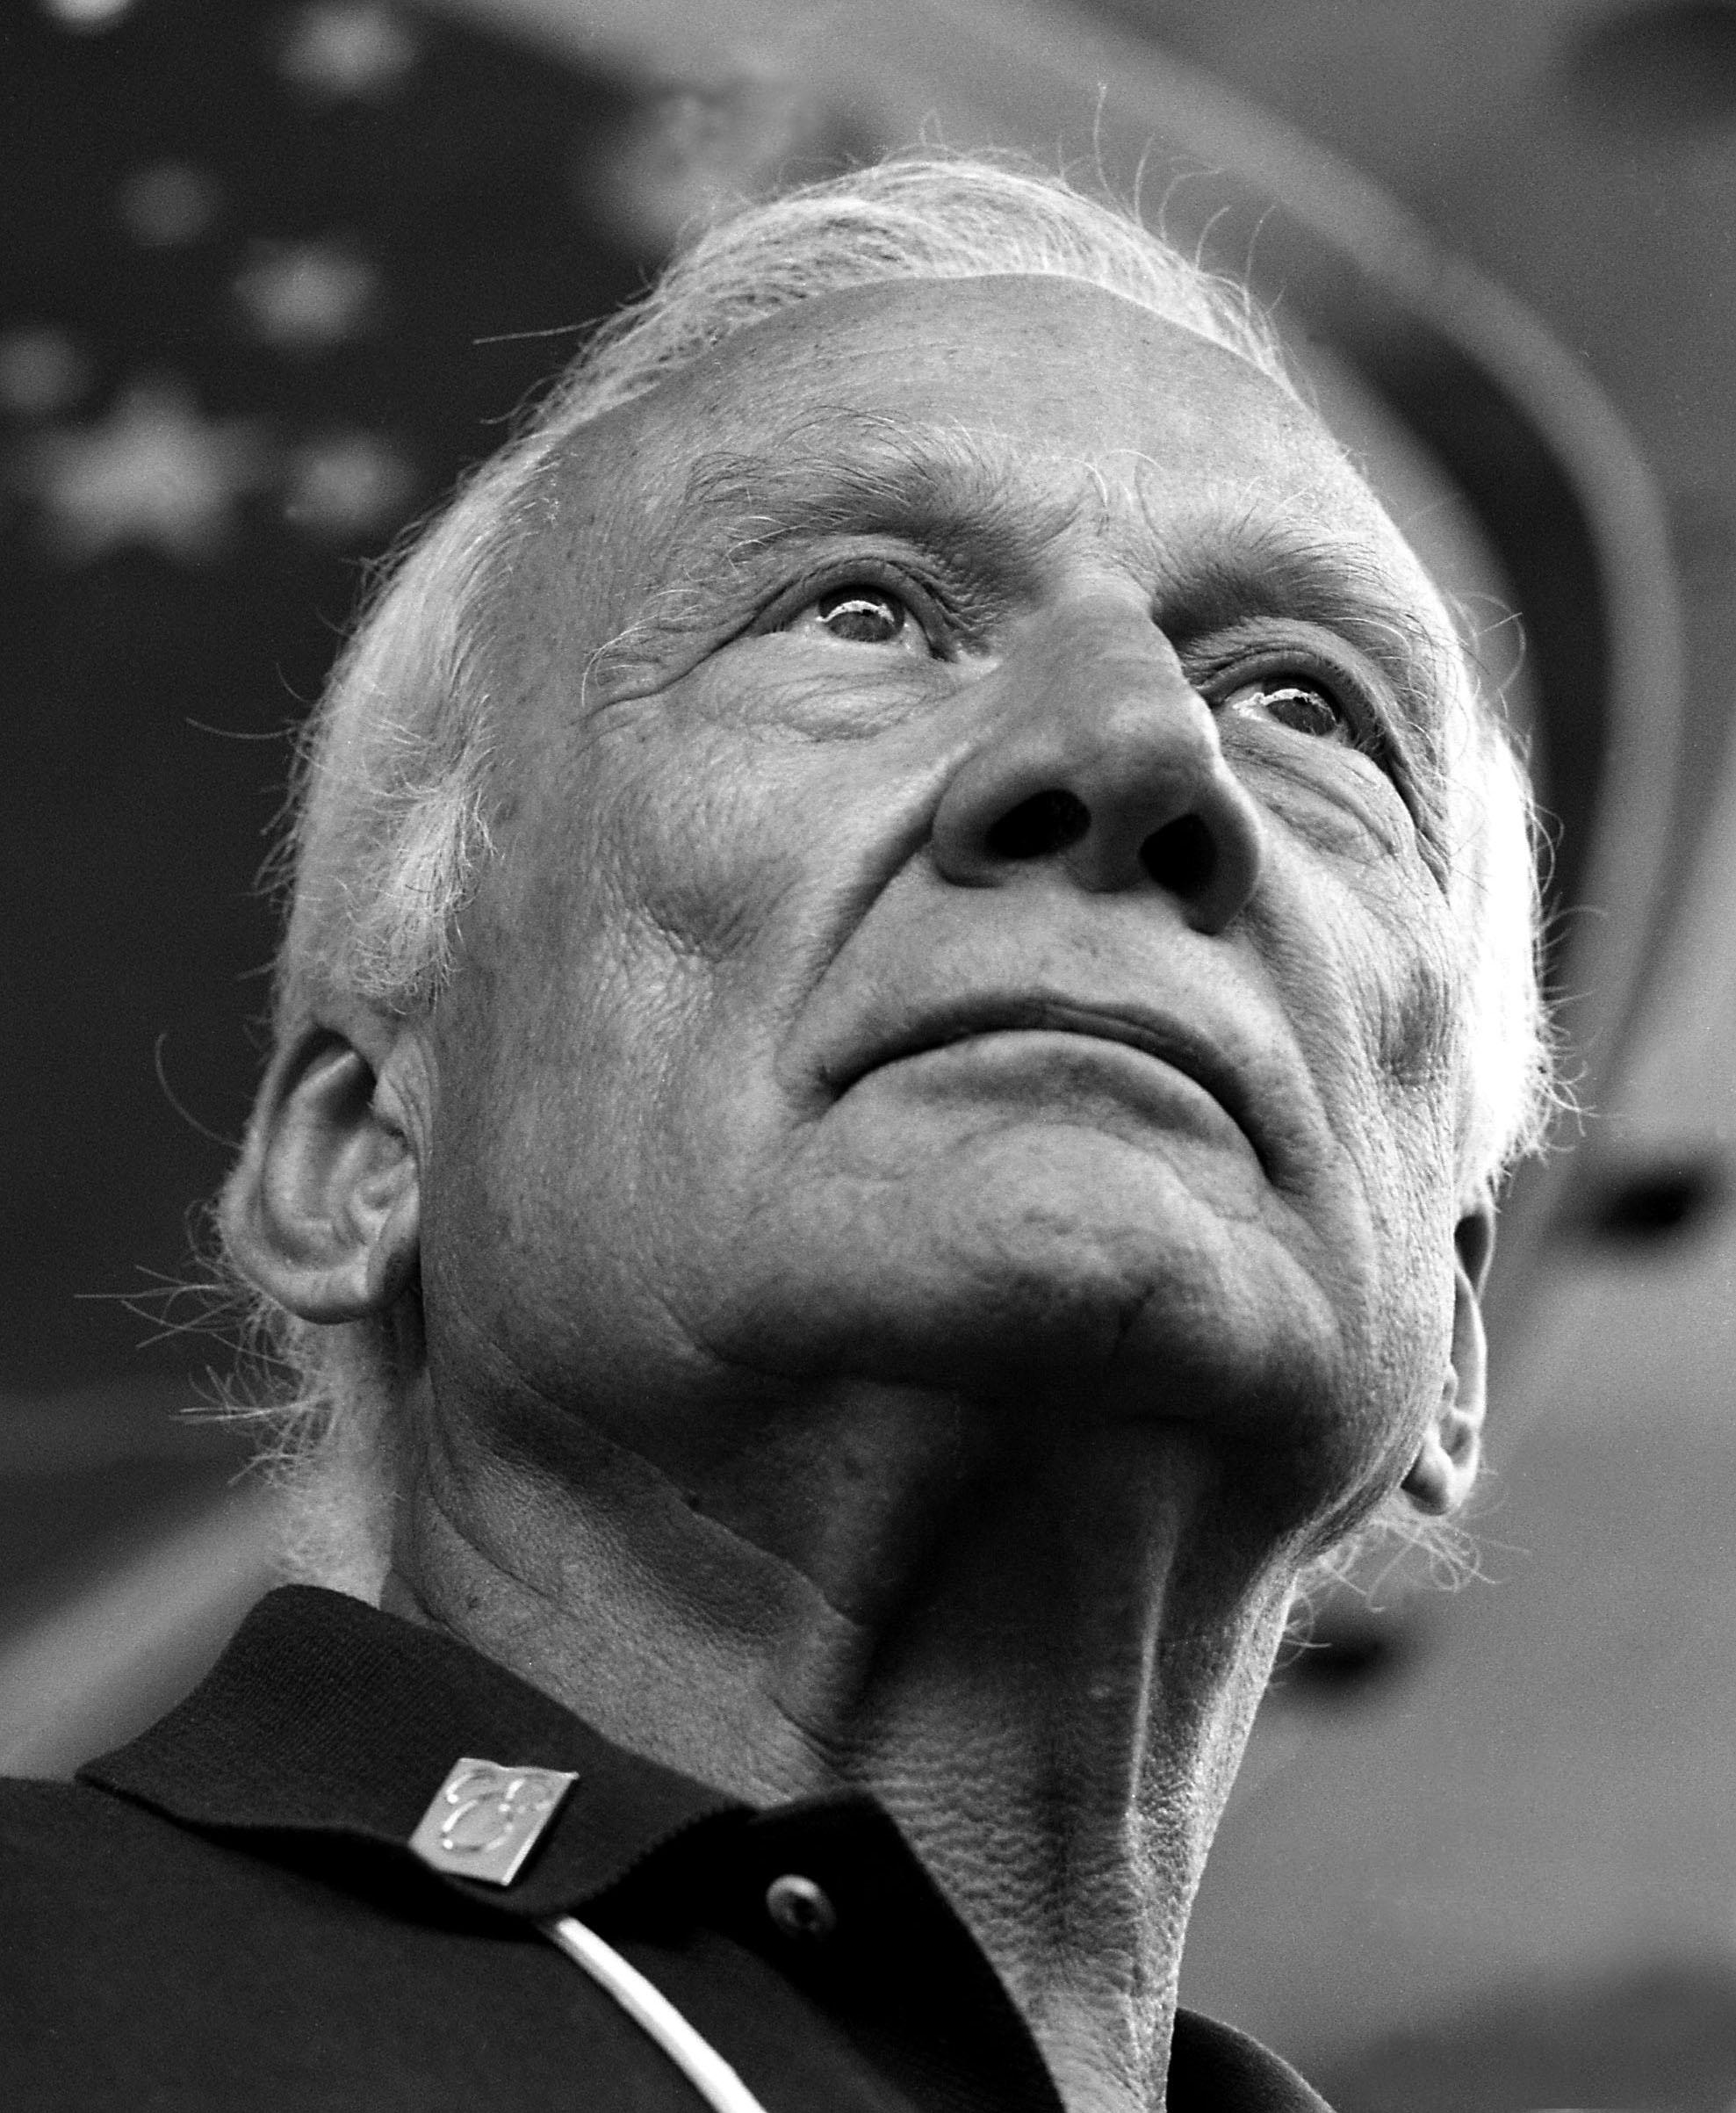 Buzz Aldrin. American astronaut.